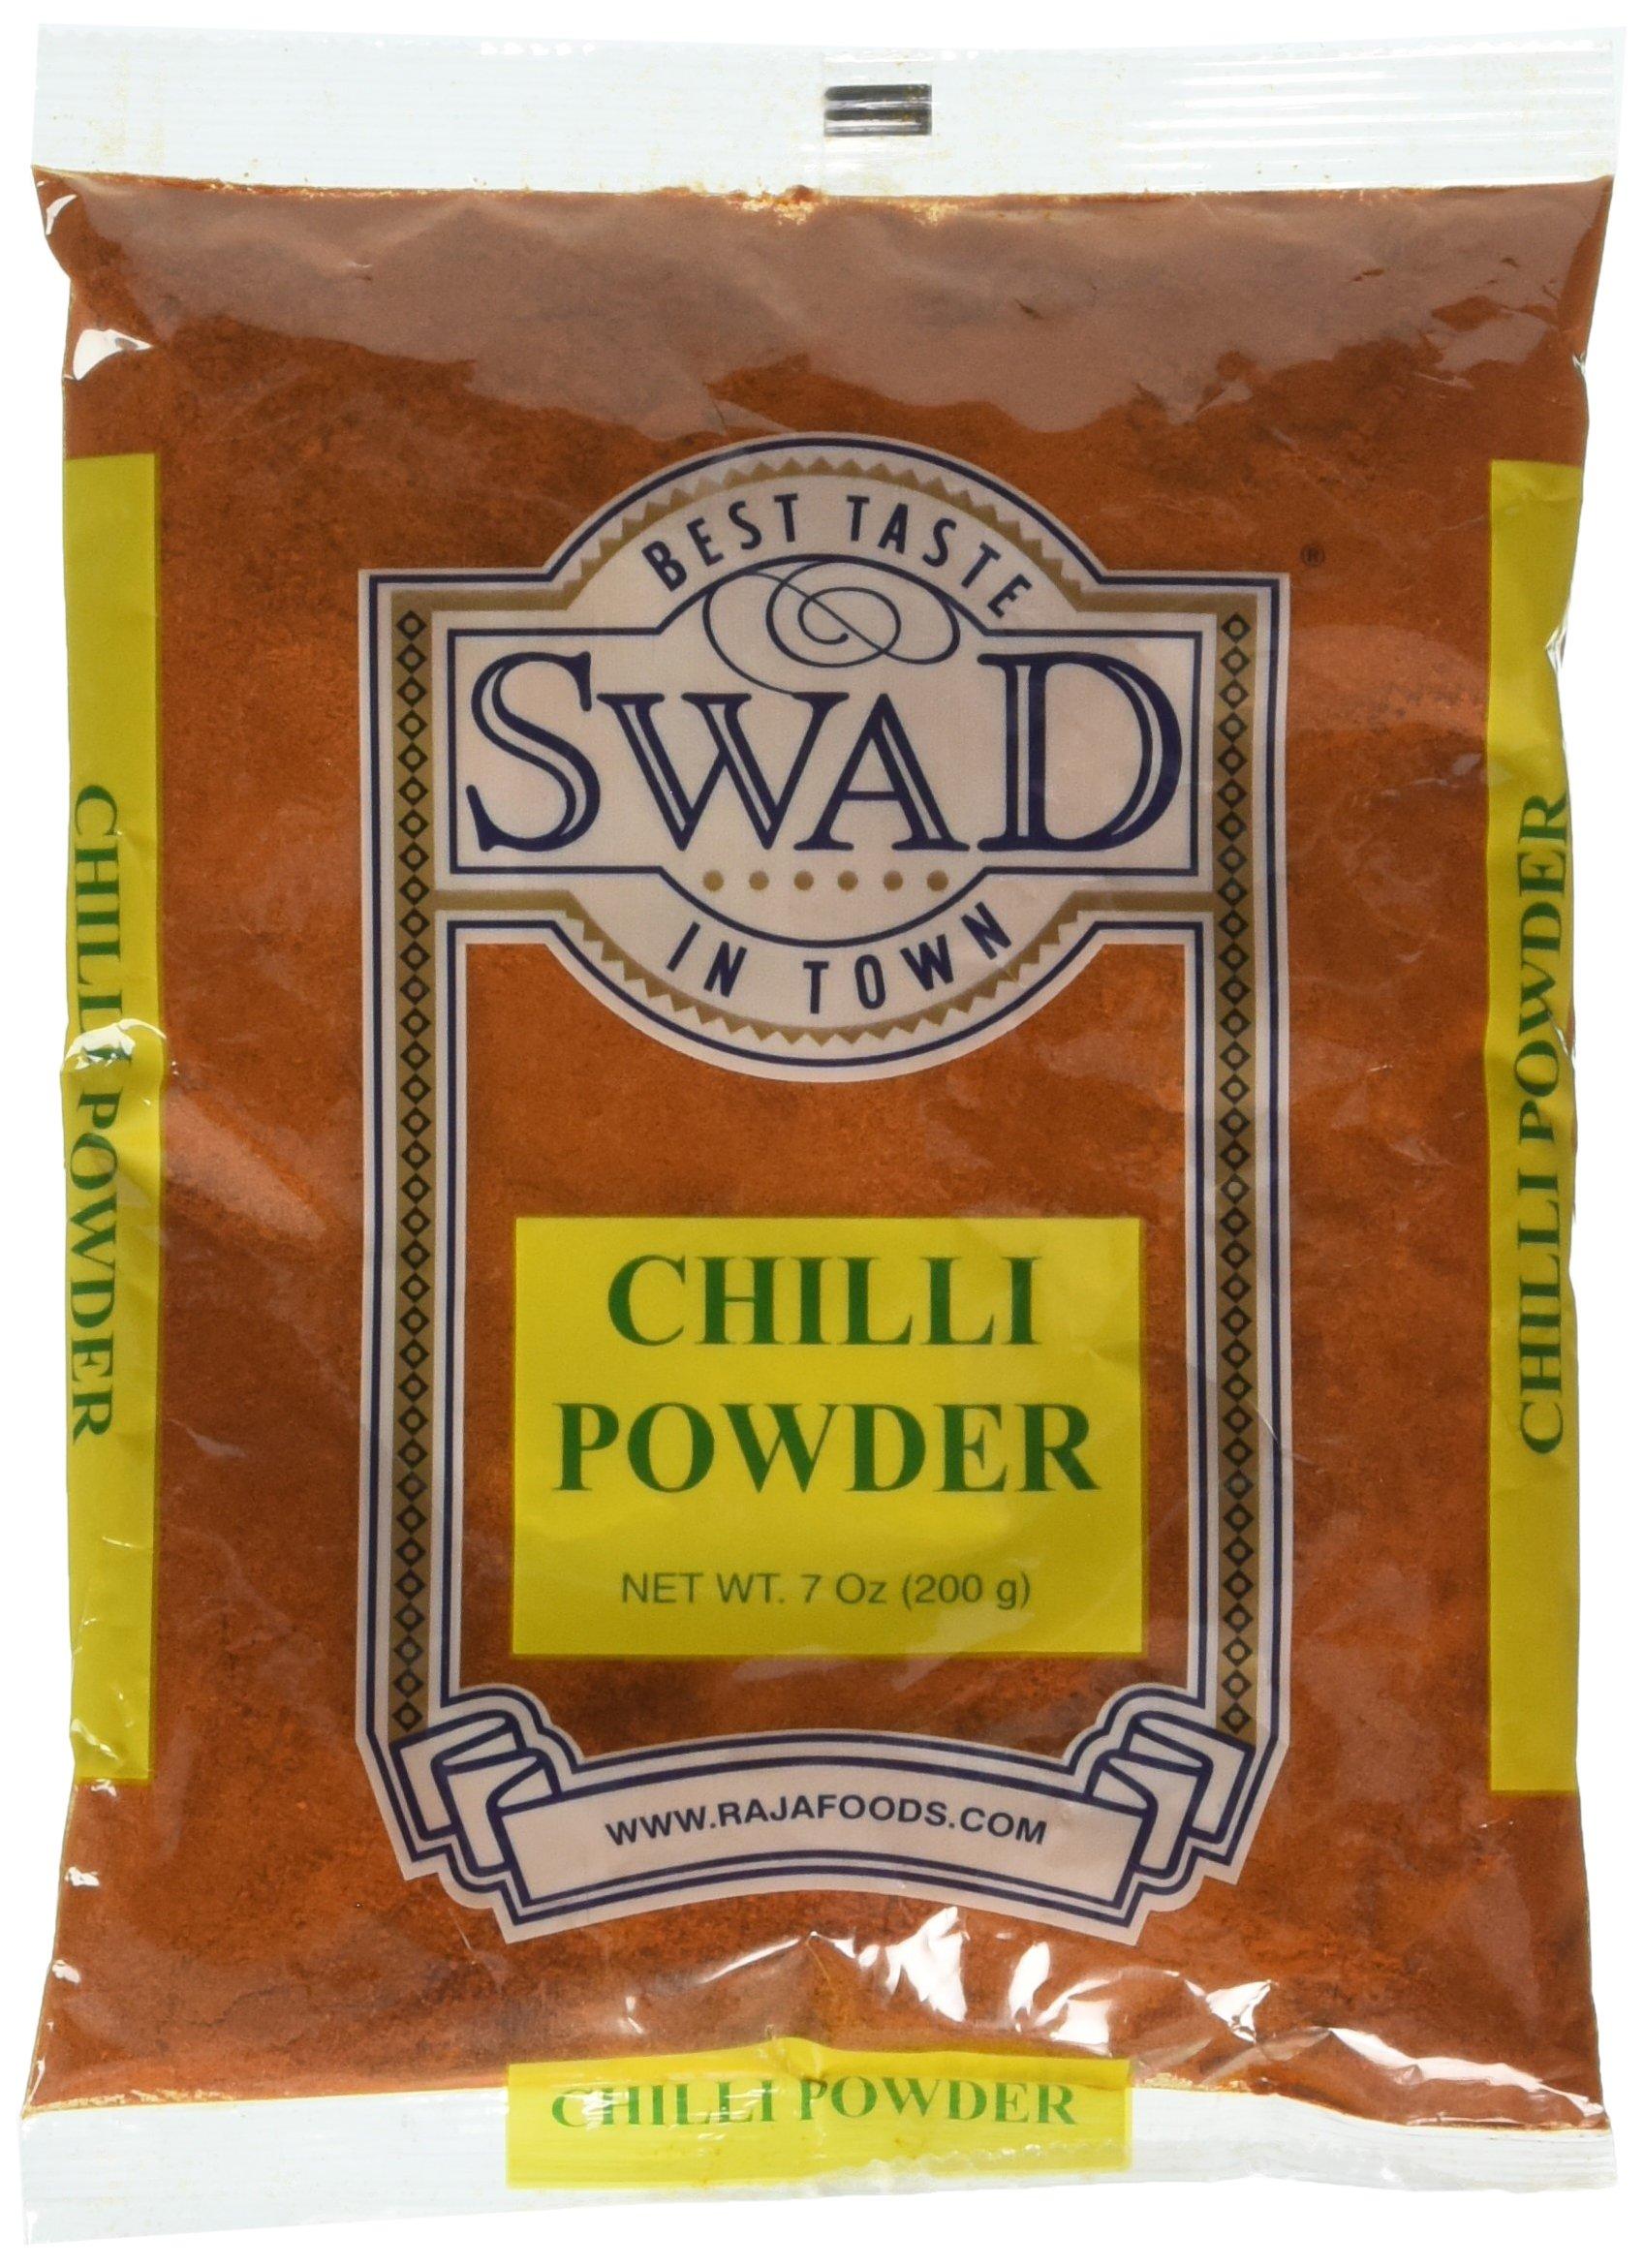 Indian Spice Swad Chili Powder Red (Regular) 7oz-